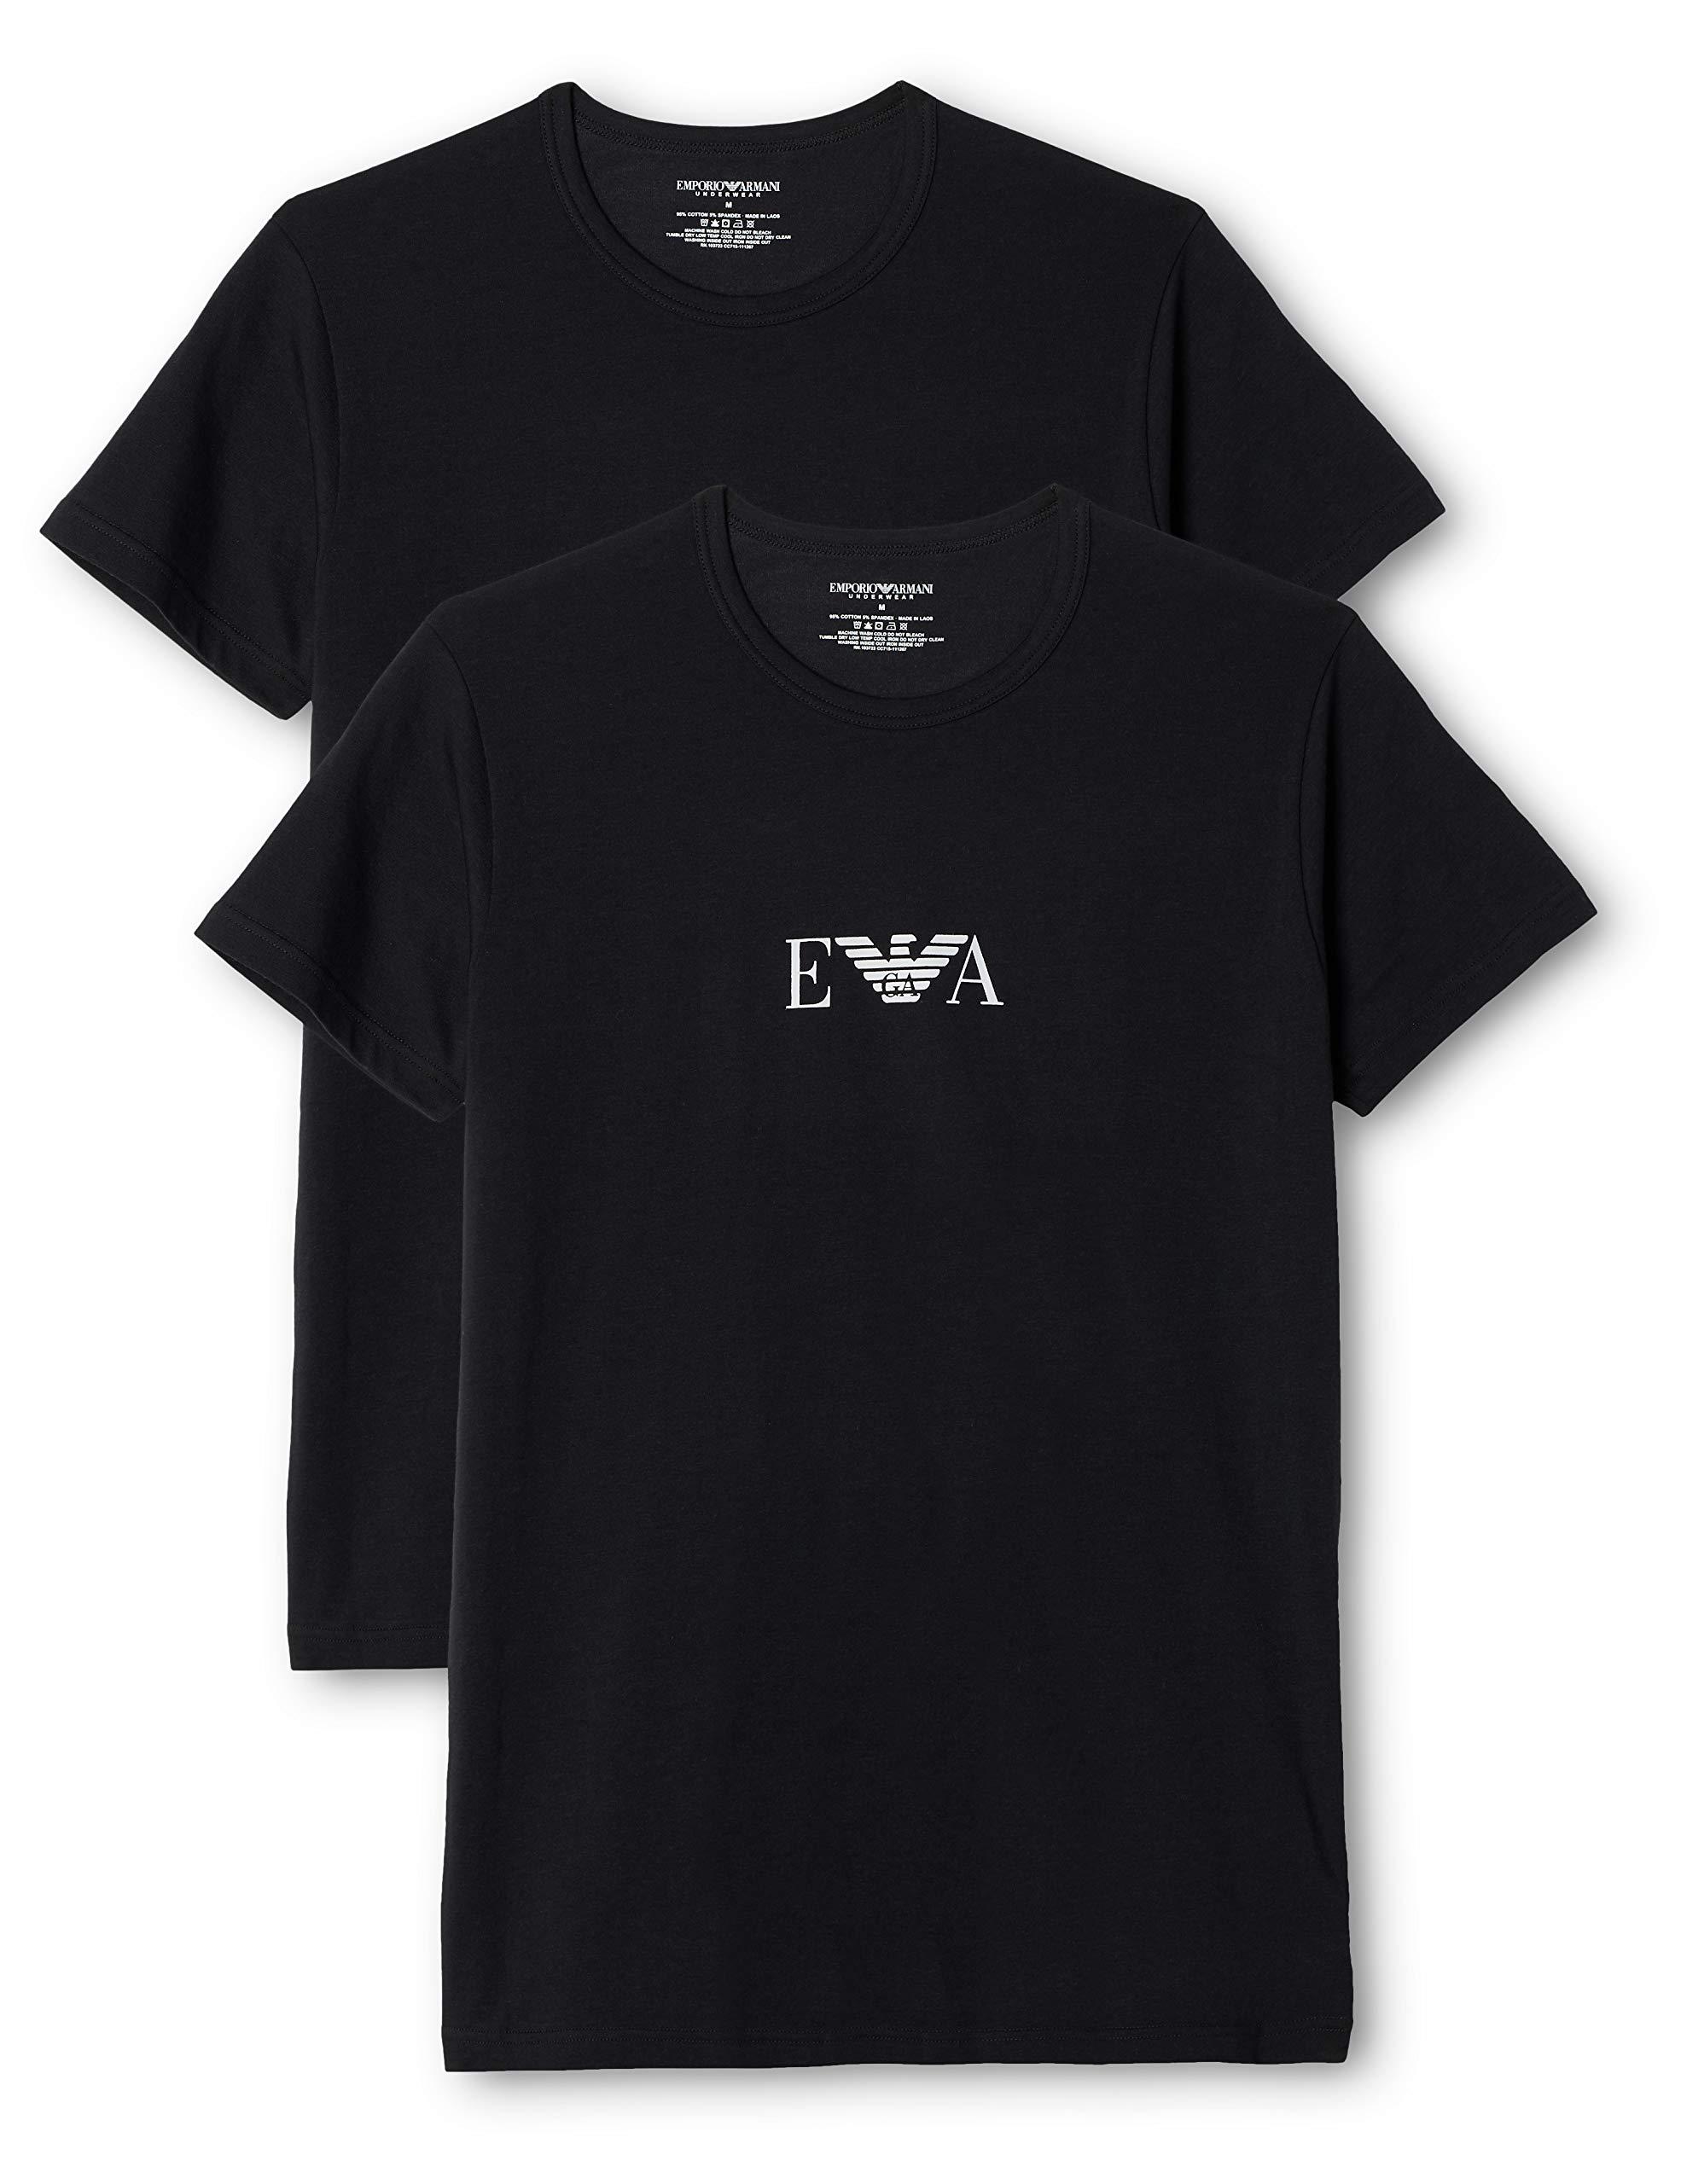 Emporio Armani, T-Shirt Uomo, set da 2 pezzi 1 spesavip